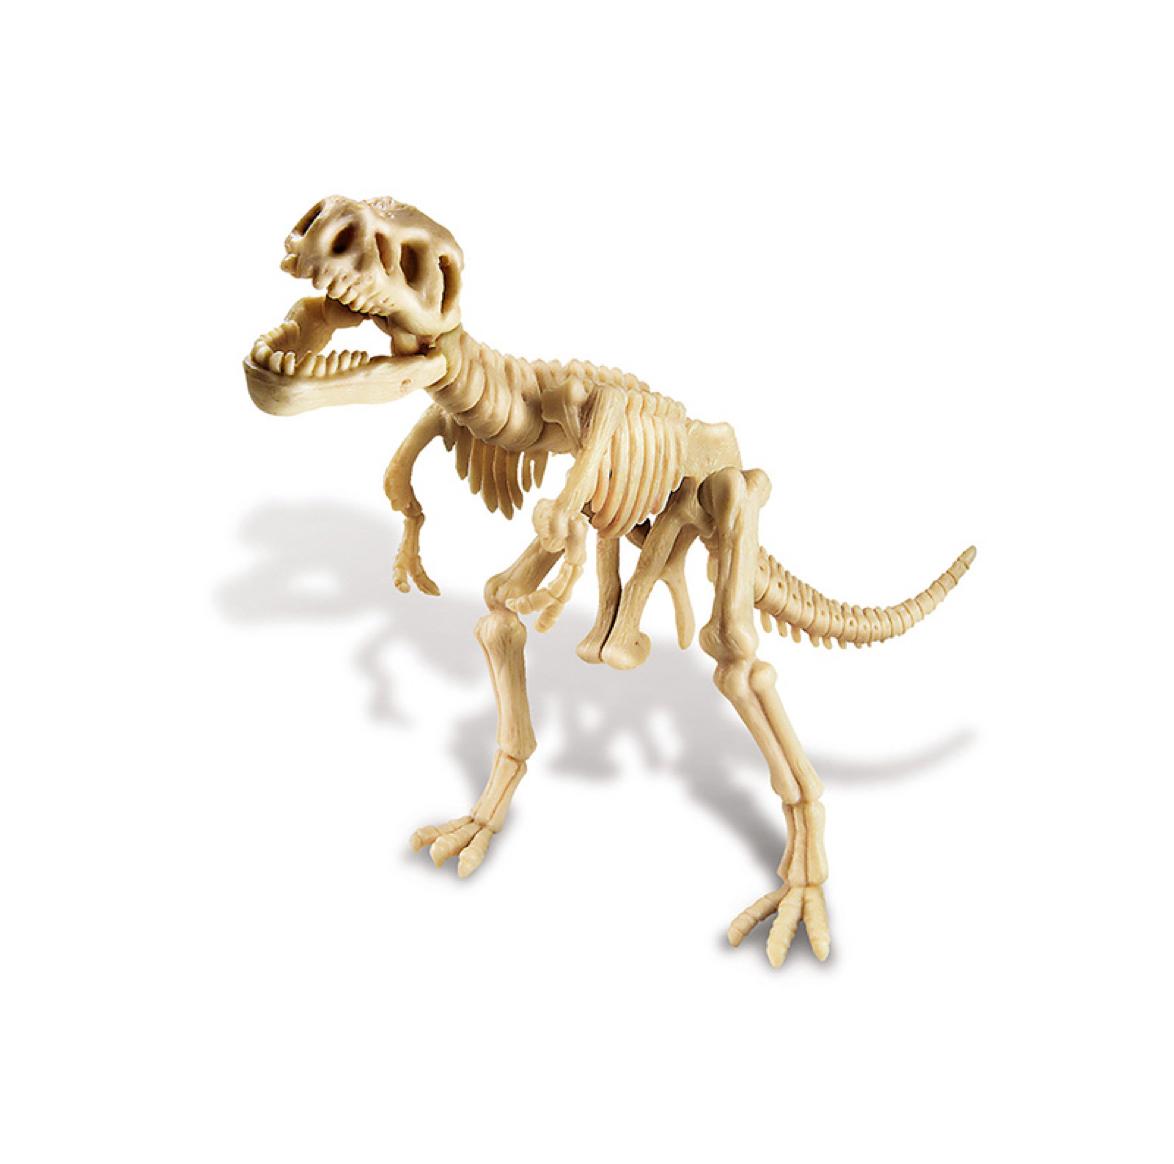 esqueleto-de-tiranosaurio-rex-tyrannosaurus-rex-skeleton-de-4m-en-el-mundo-de-mico-2